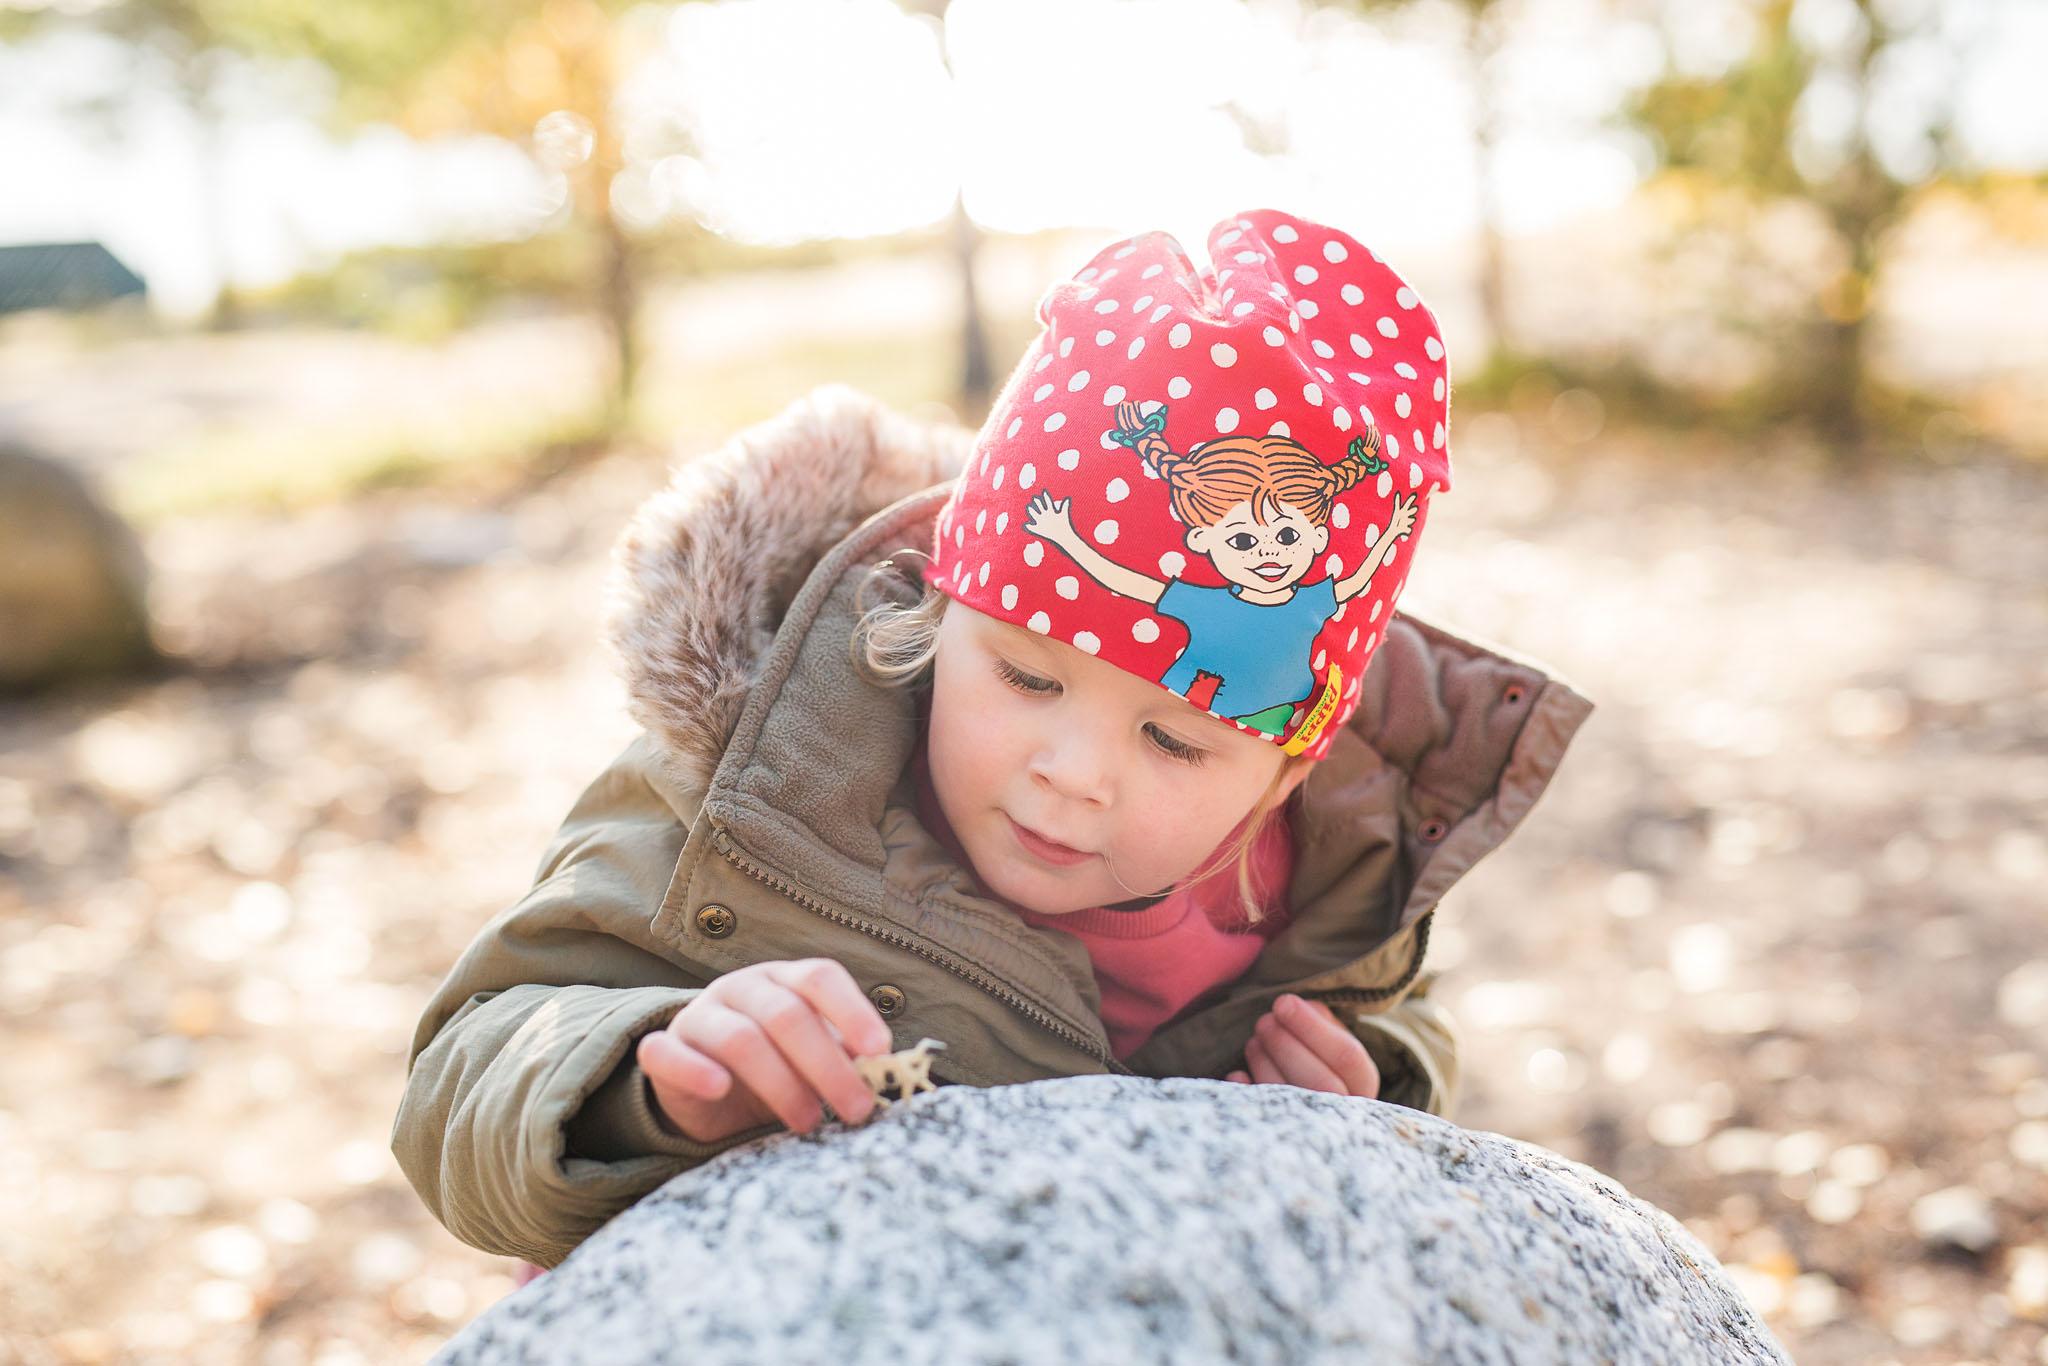 fotograf sabina wixner hudiksvall barn familj 12.jpg